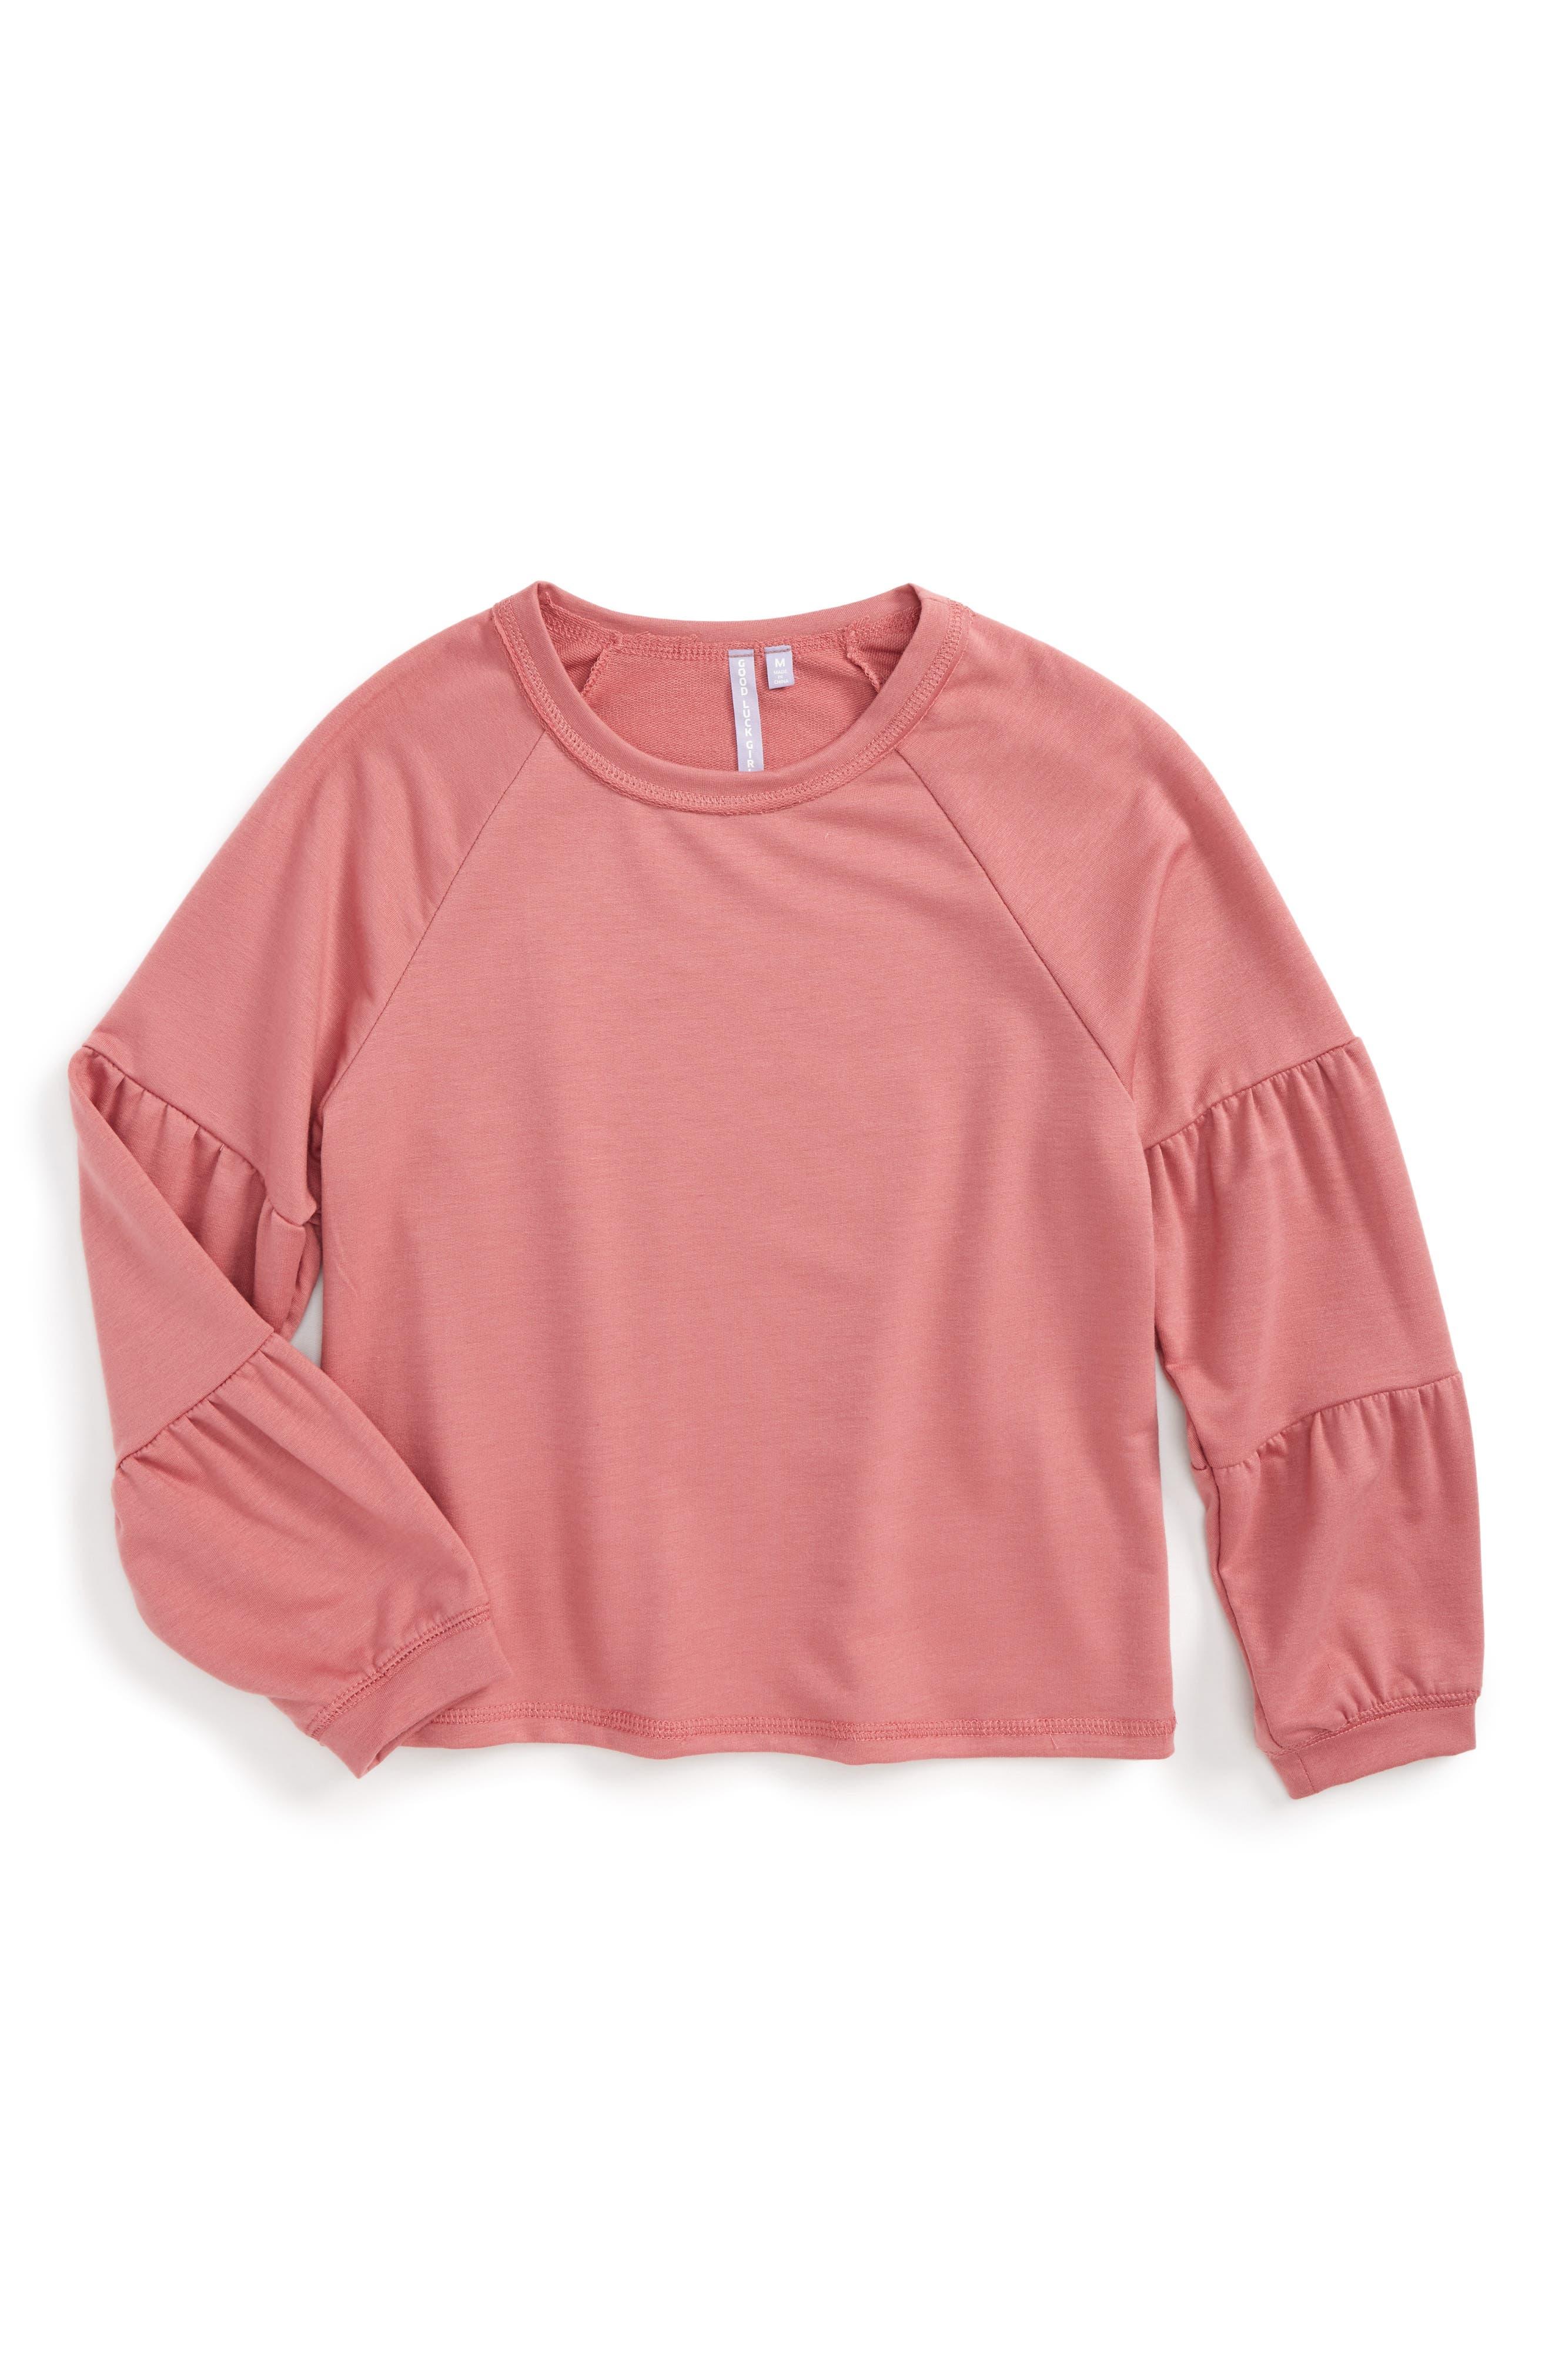 Tiered Sleeve Sweatshirt,                             Main thumbnail 1, color,                             Mauve